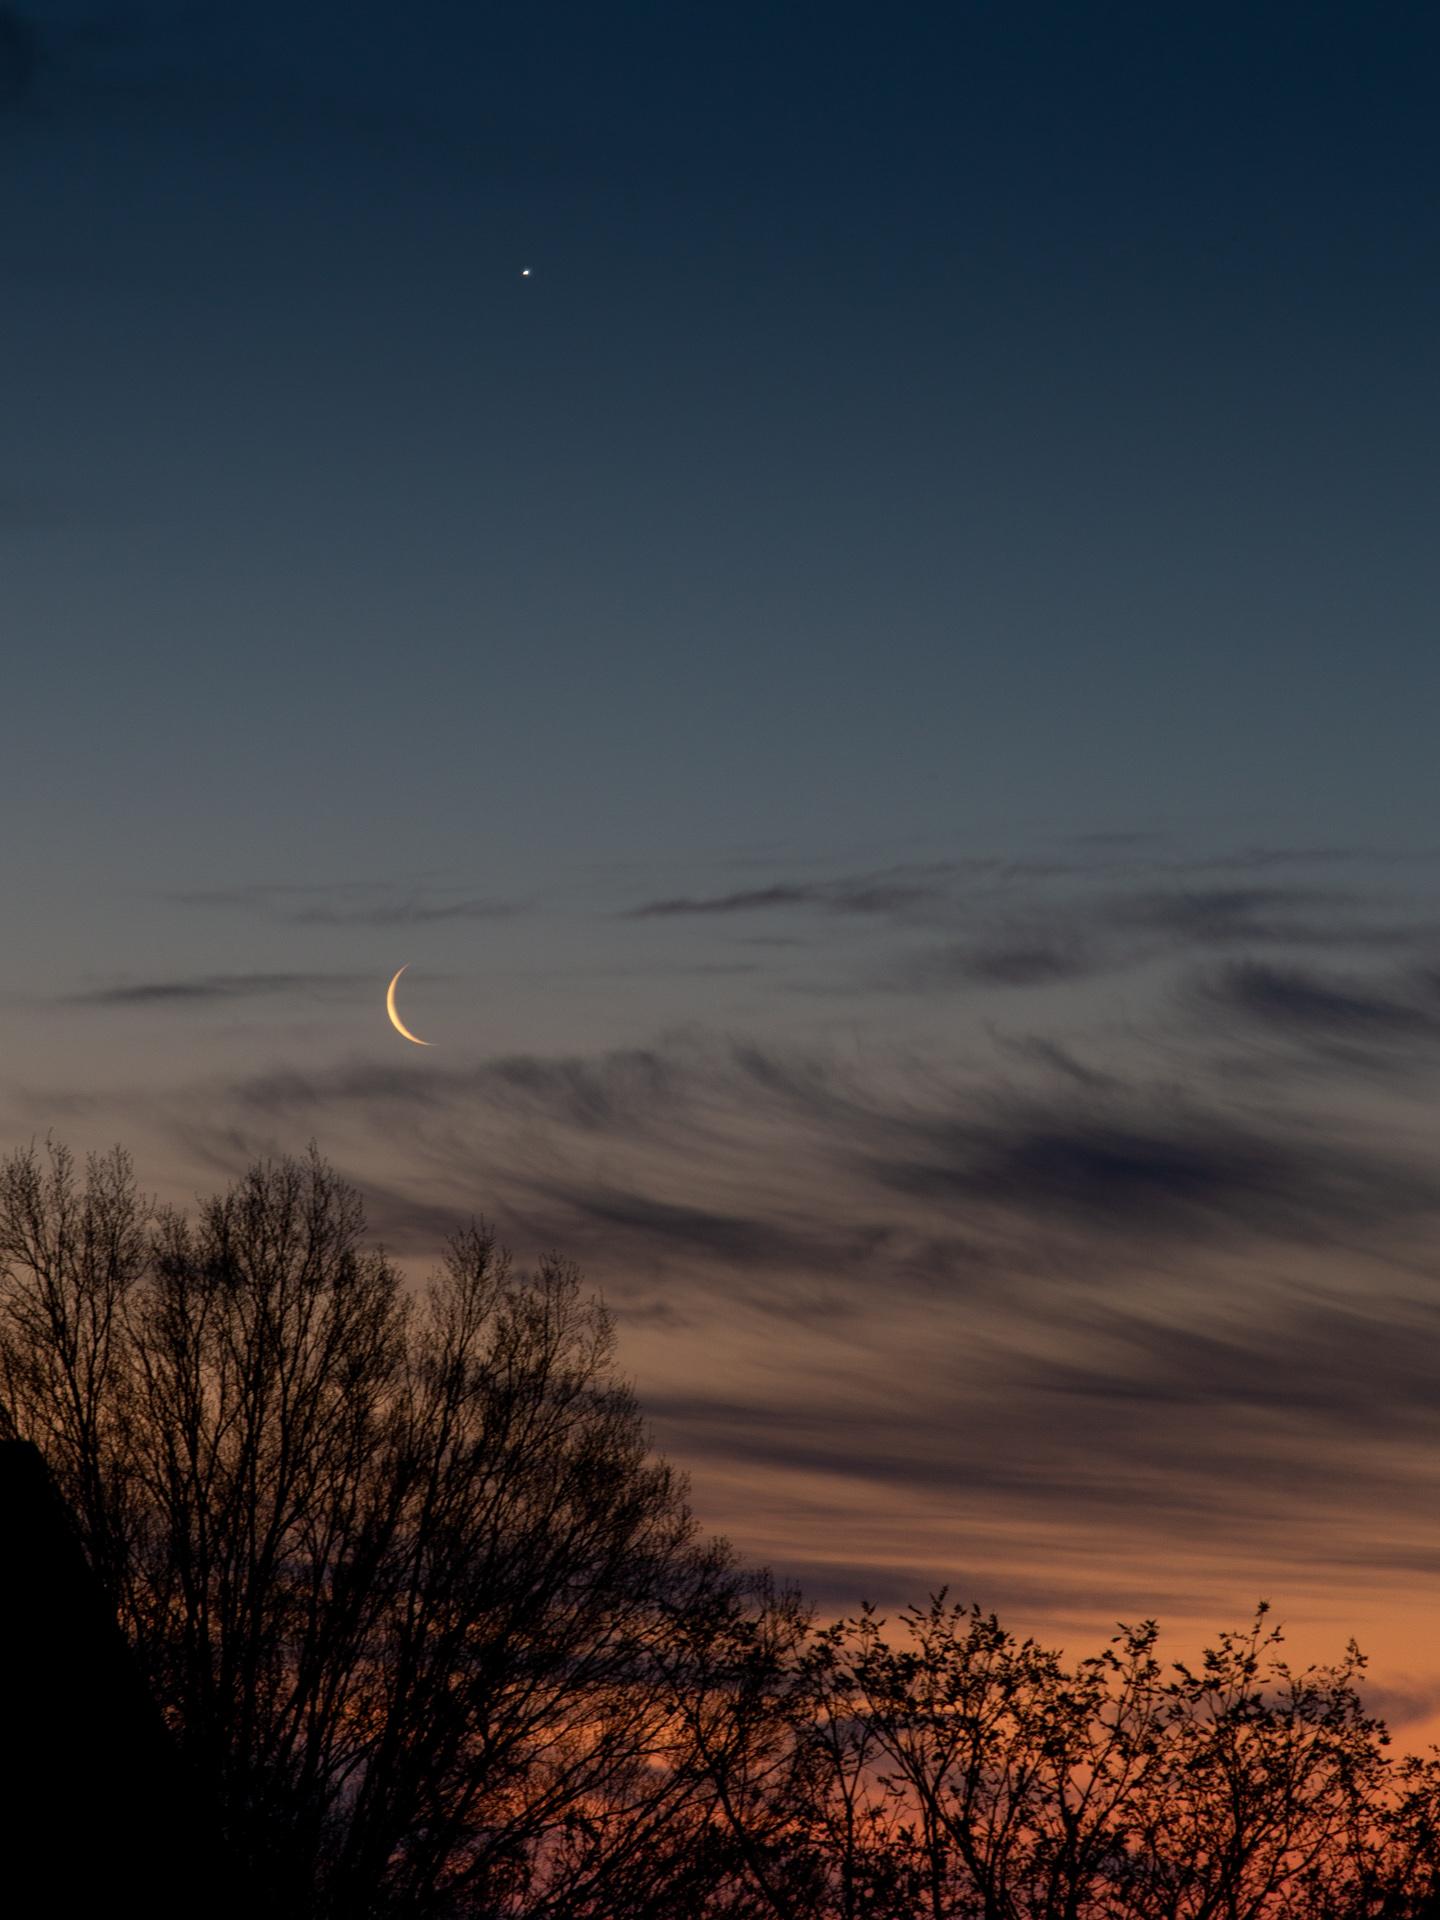 Waning Crescent Moon and Venus | 20190402 0629 E:38.96x77.00@84m